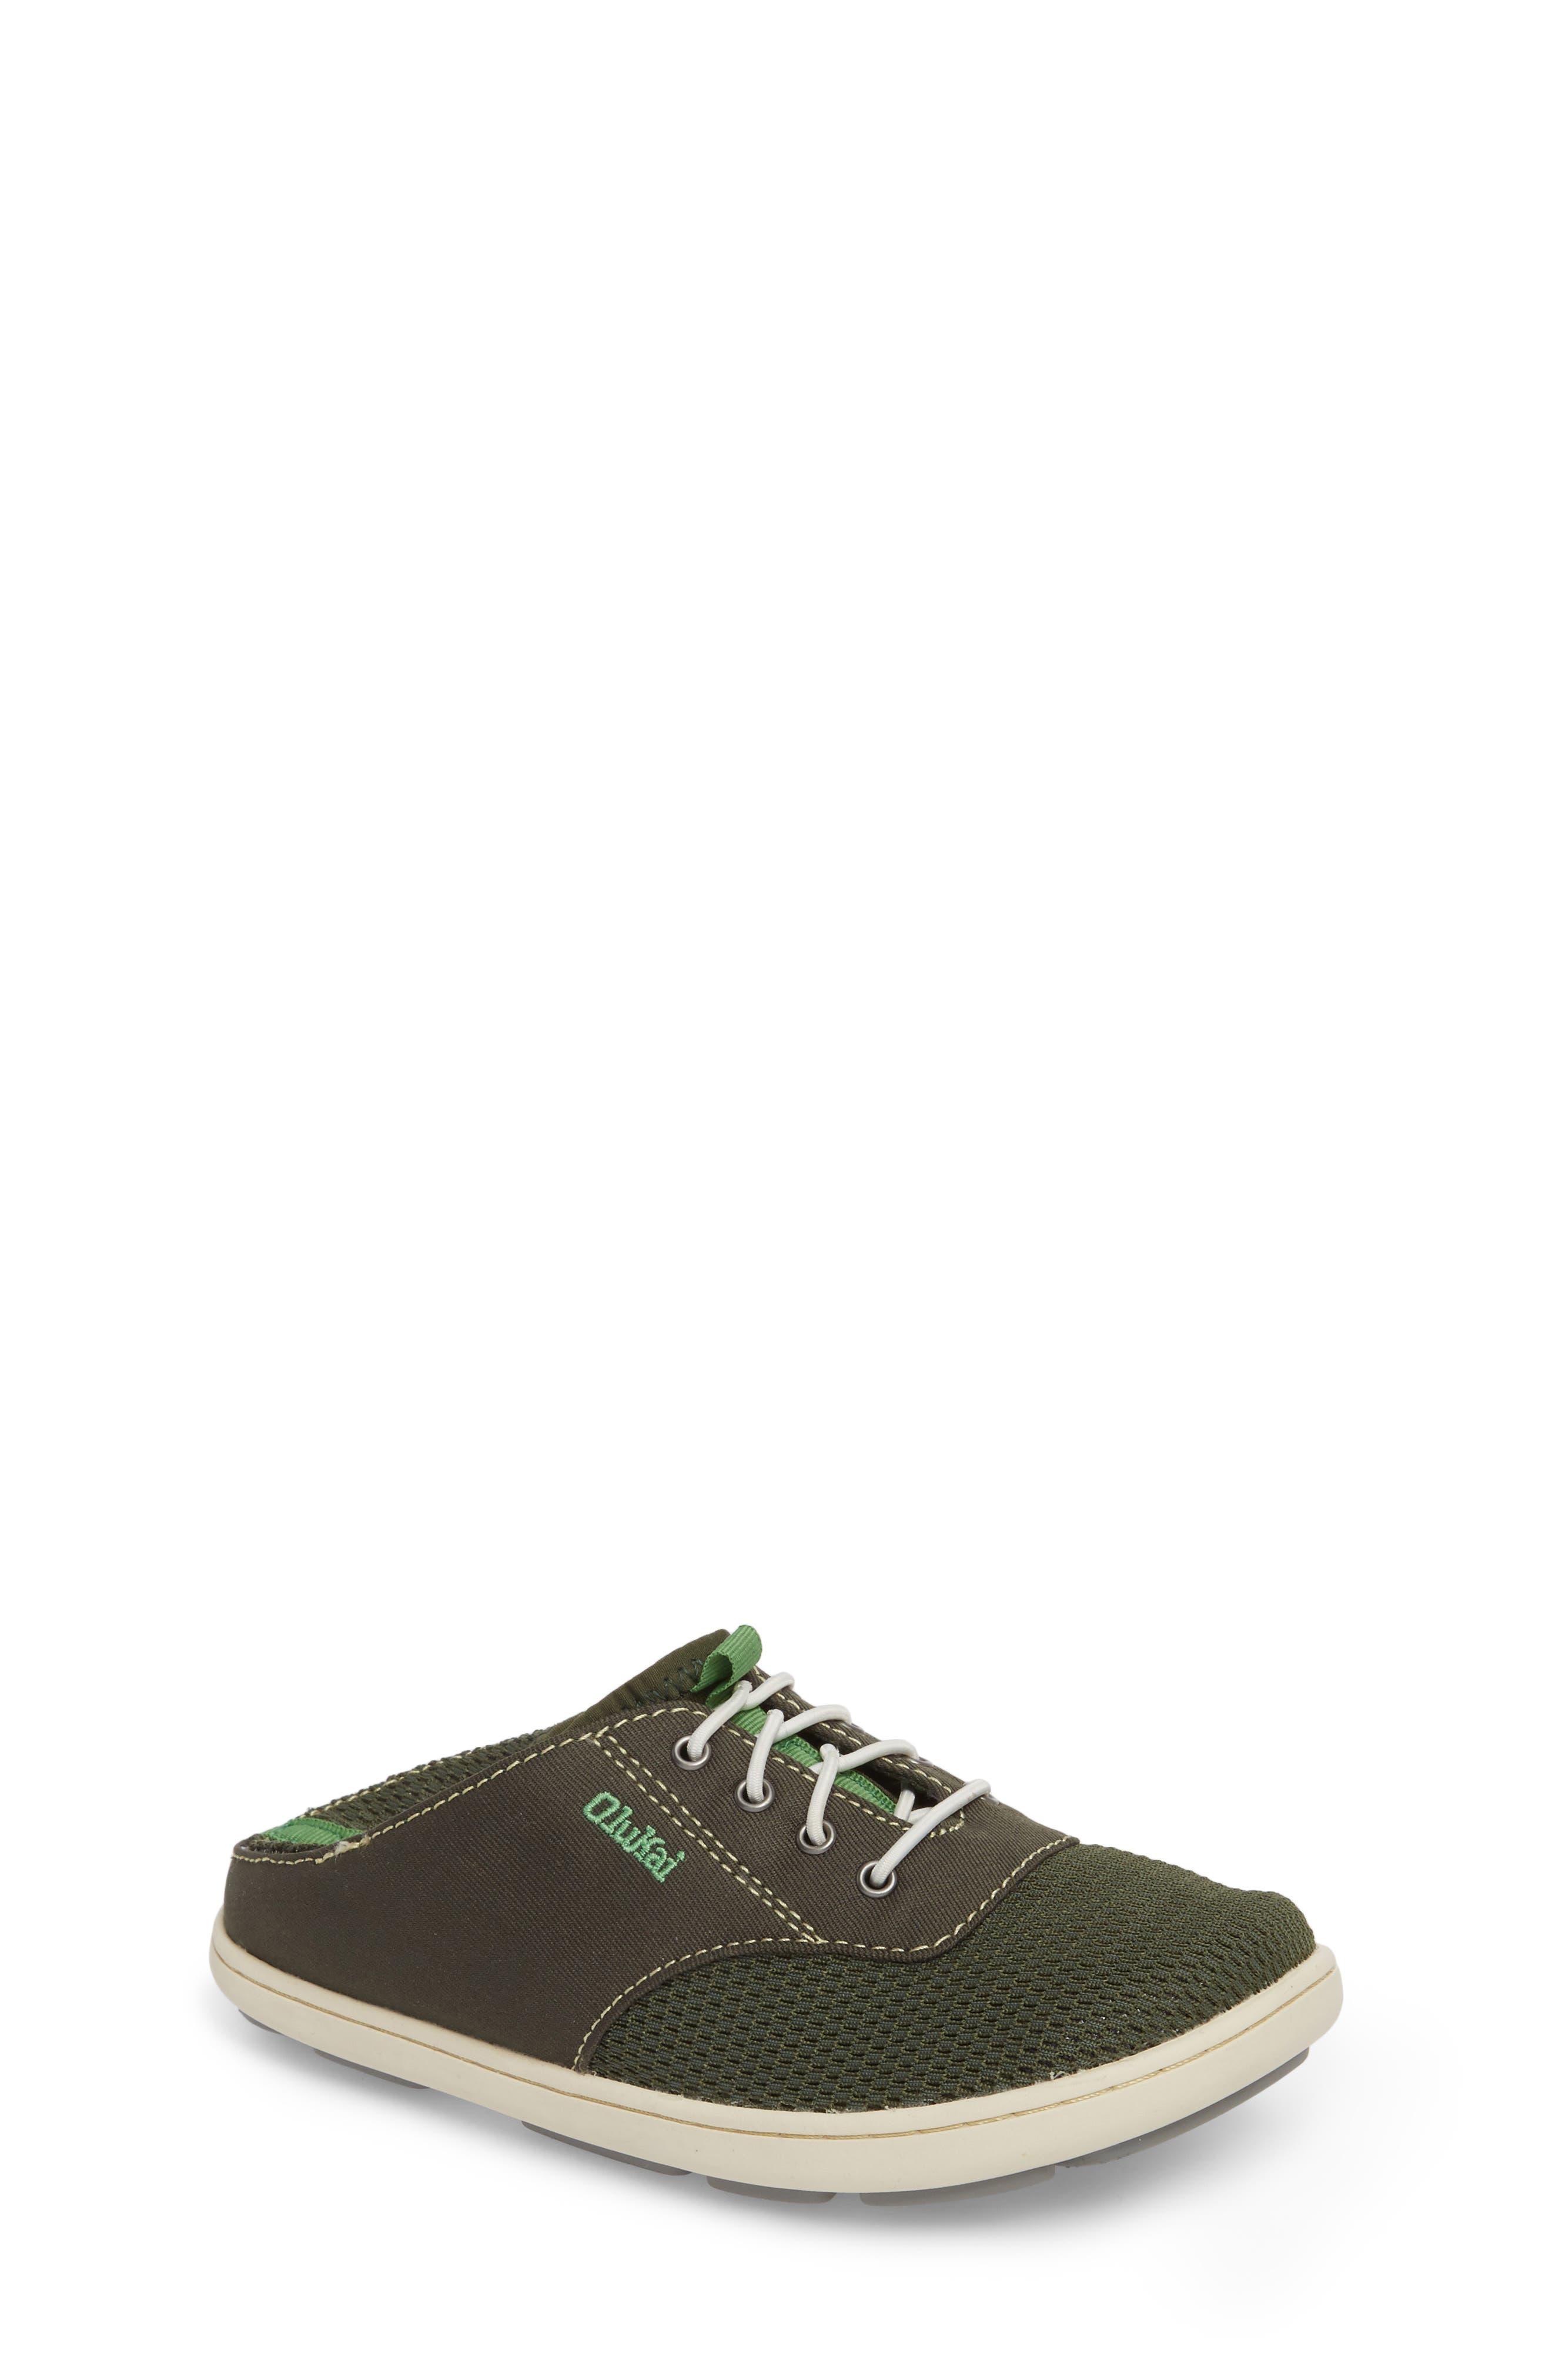 OLUKAI, Nohea Moku Water Resistant Shoe, Main thumbnail 1, color, SEA GRASS/ SEA GRASS